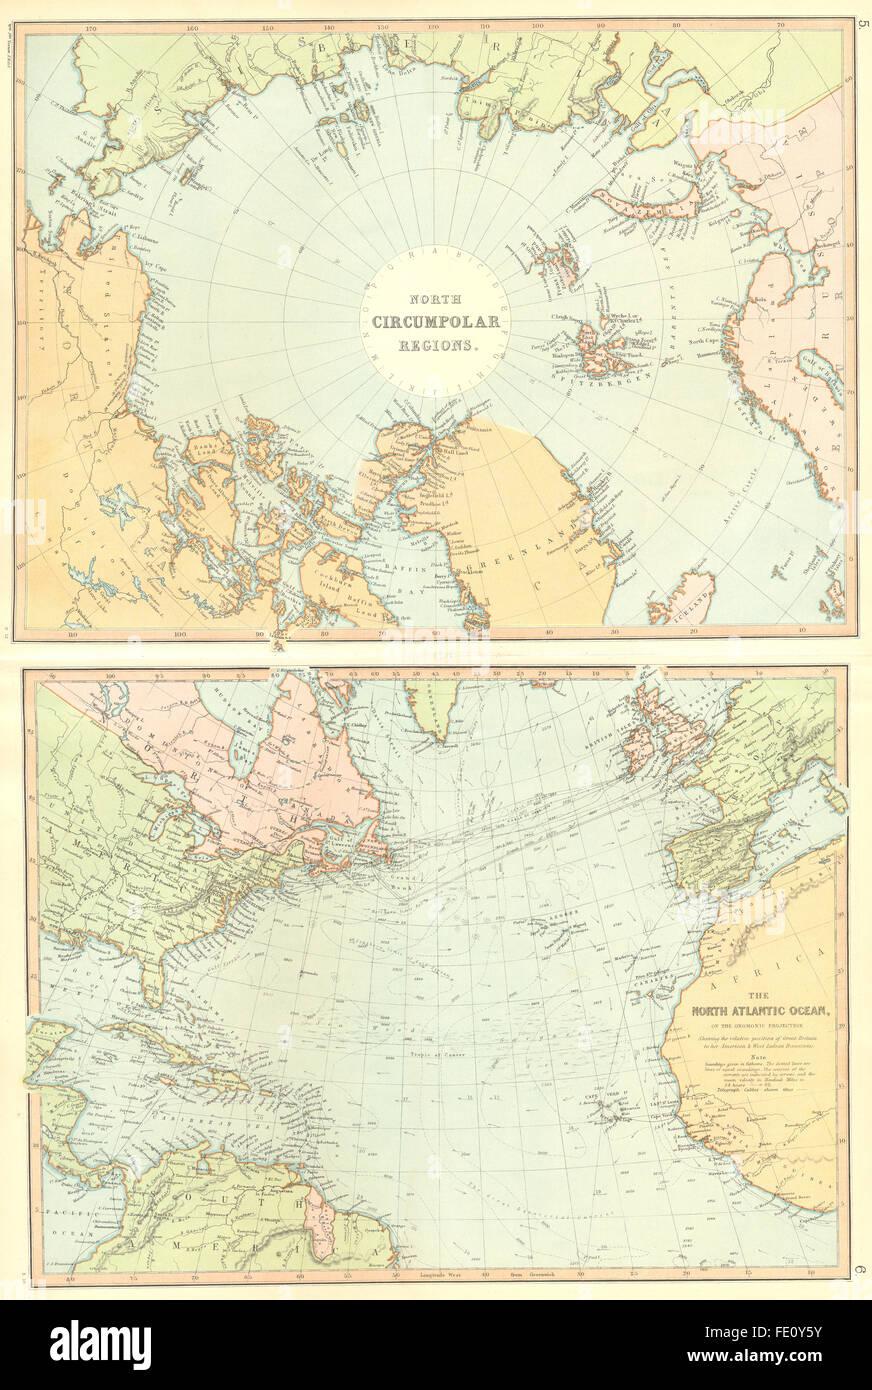 Nordpolarmeer Karte.Nordpolarmeer Circumpolar Region Nord Nordpol Greenland Blackie